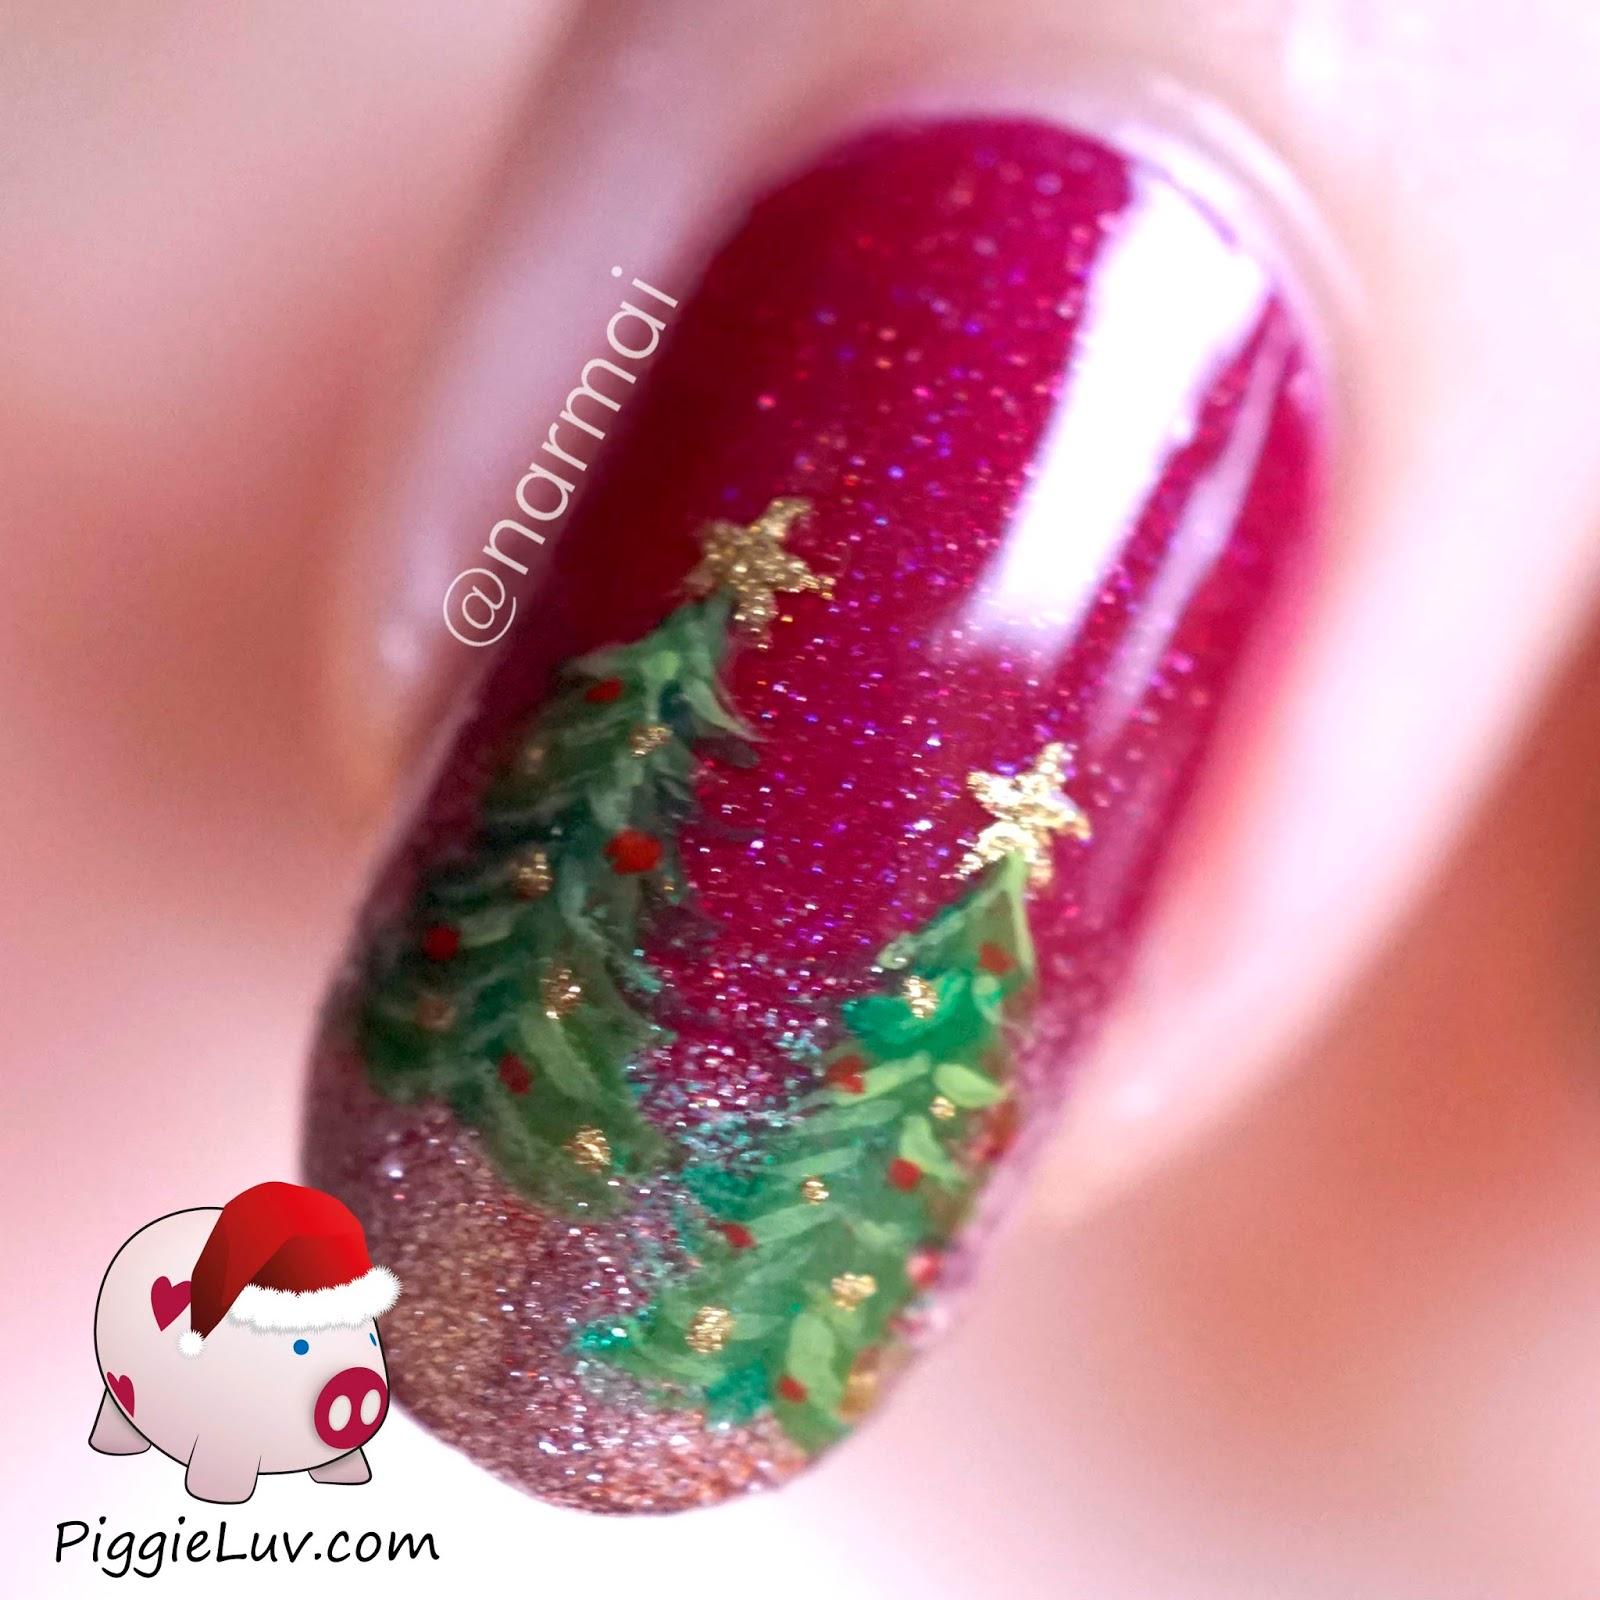 Christmas Tree Nail Art: PiggieLuv: Christmas Trees Nail Art